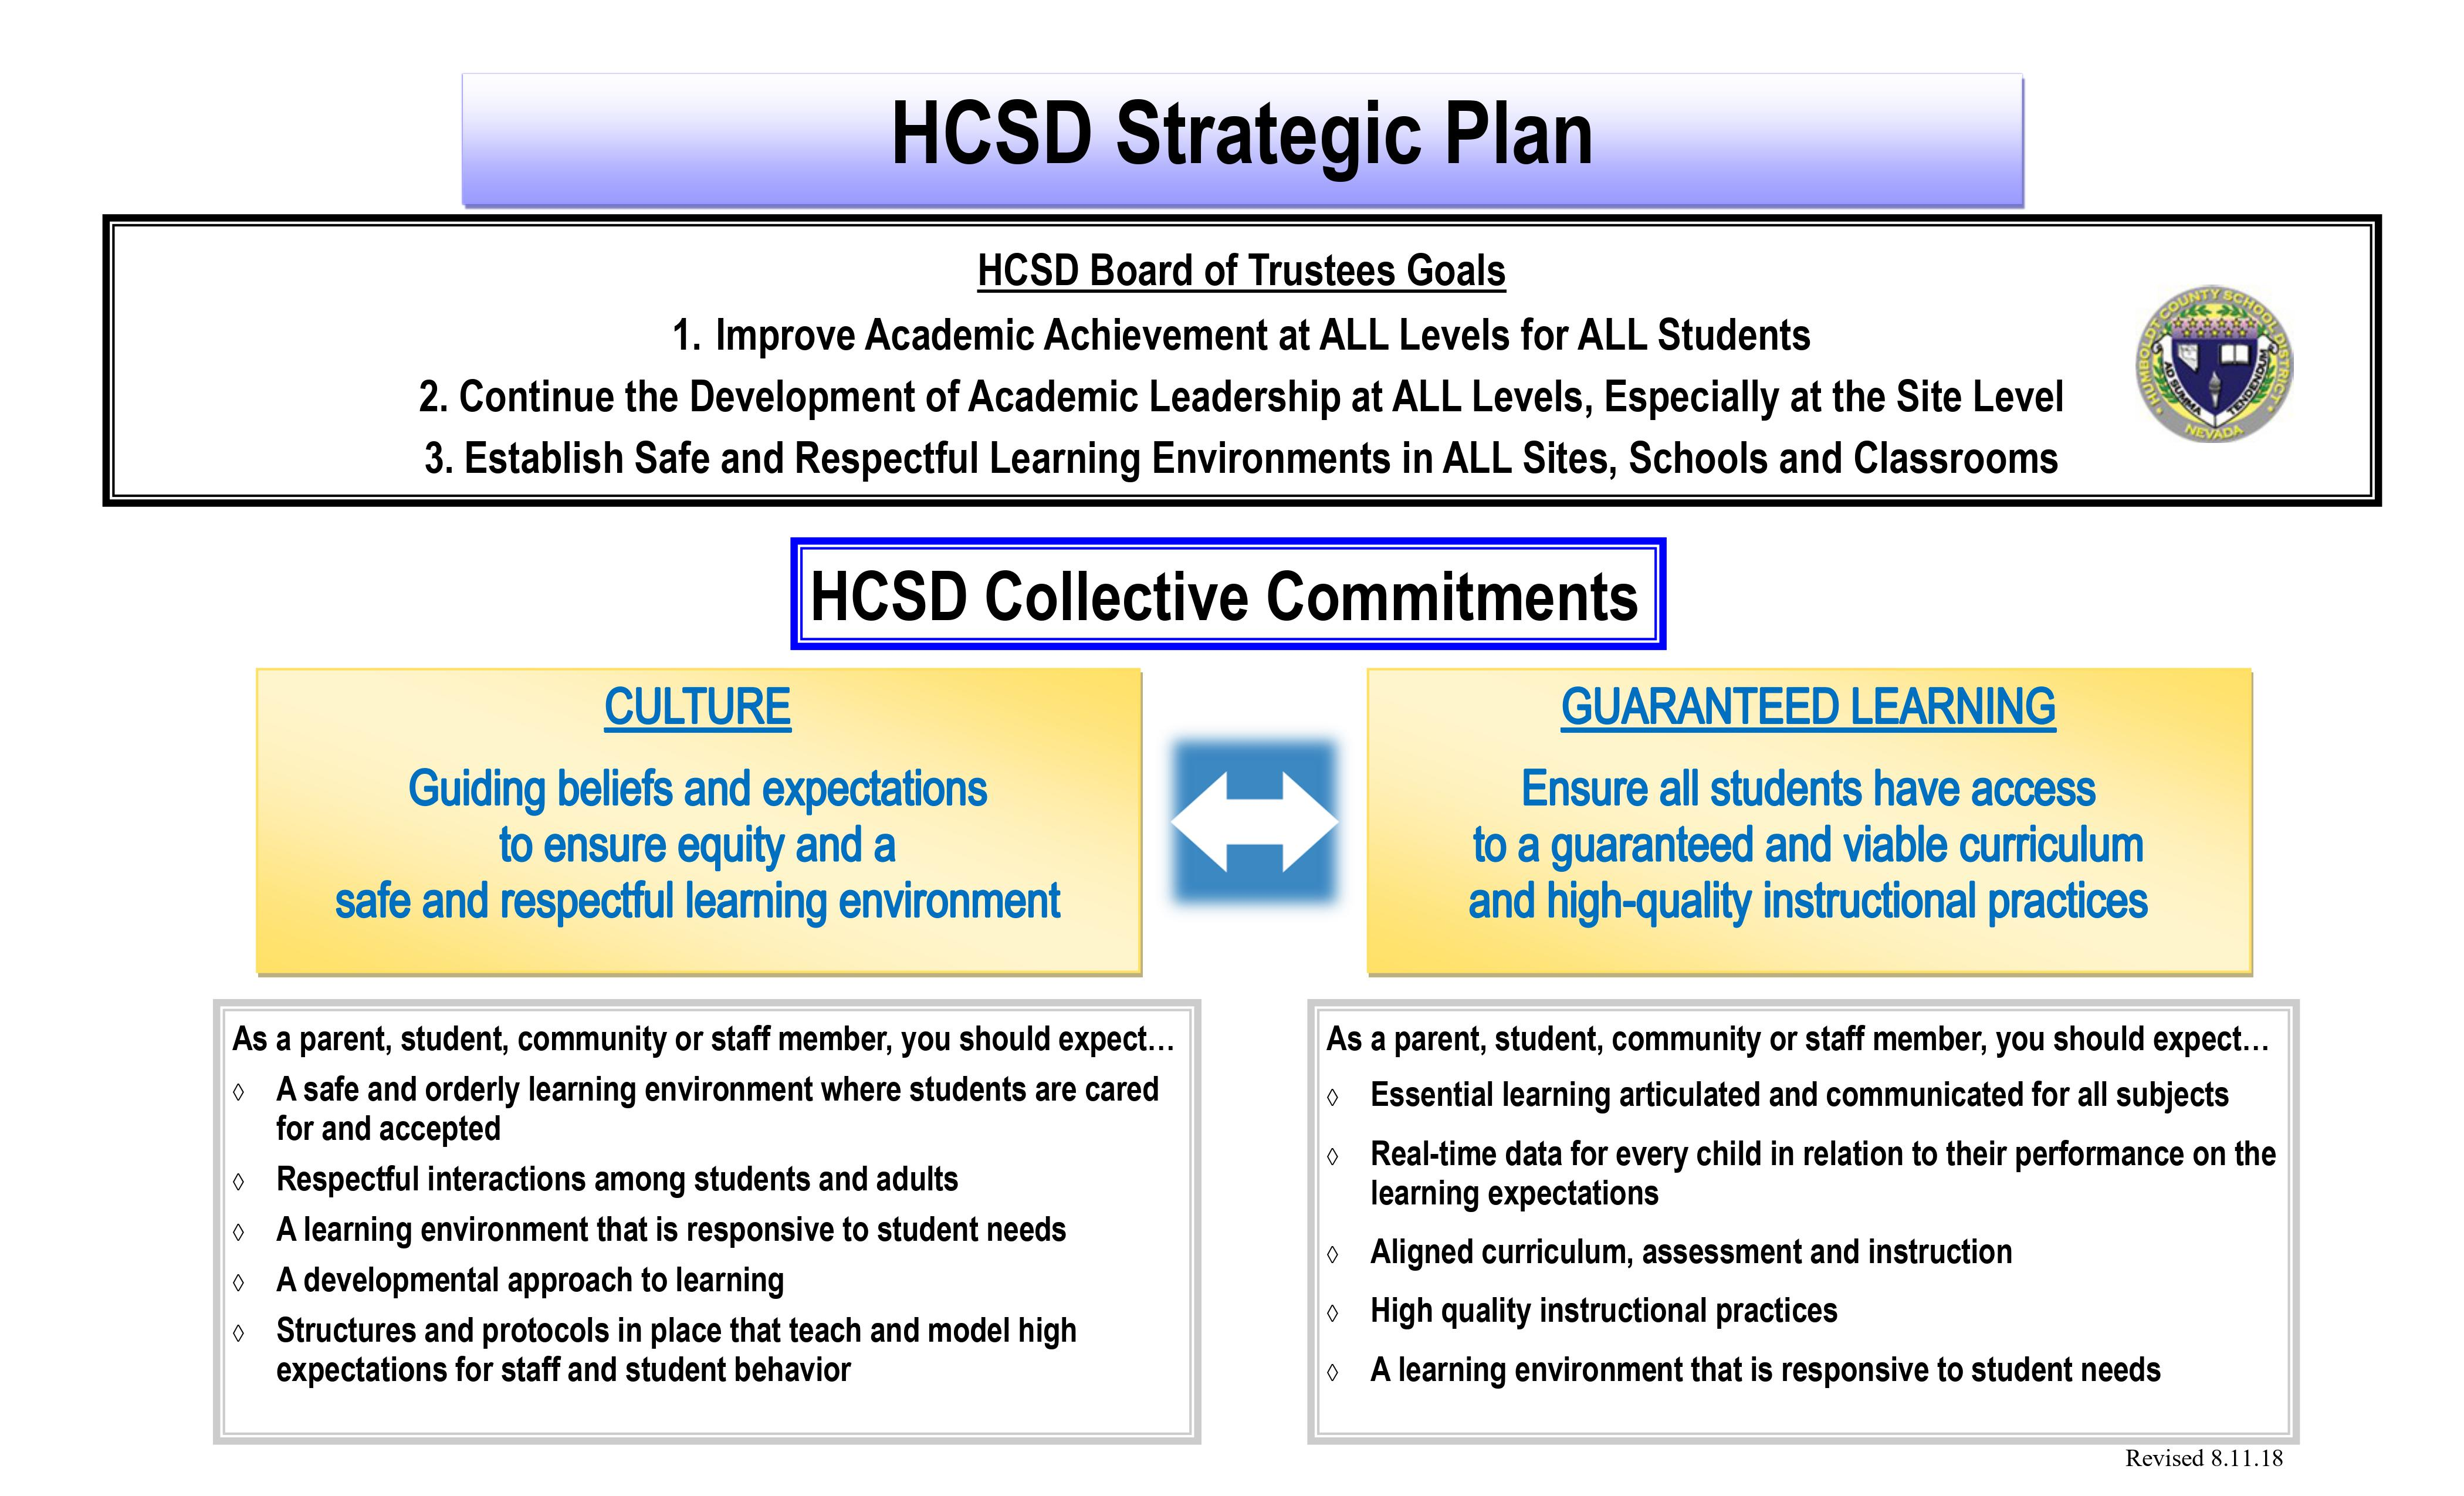 HCSD Strategic Plan